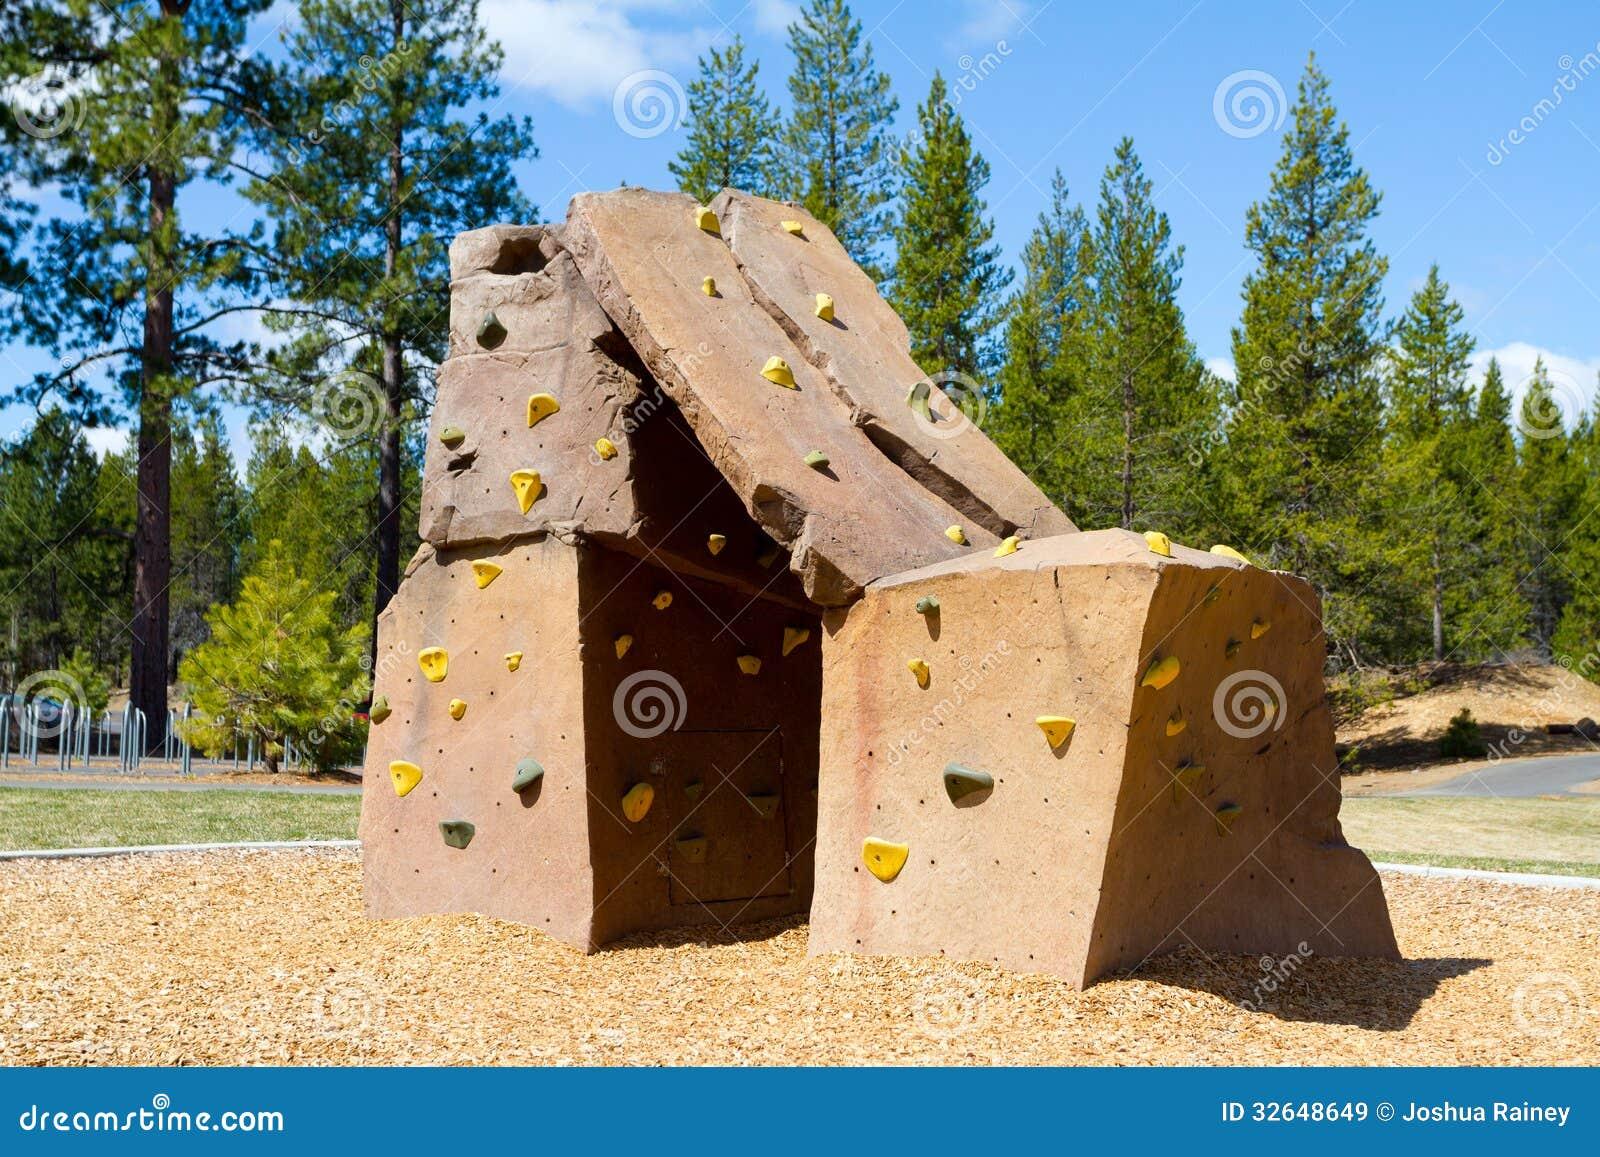 Rock Climbing Wall At Park. Playground, Handhold.